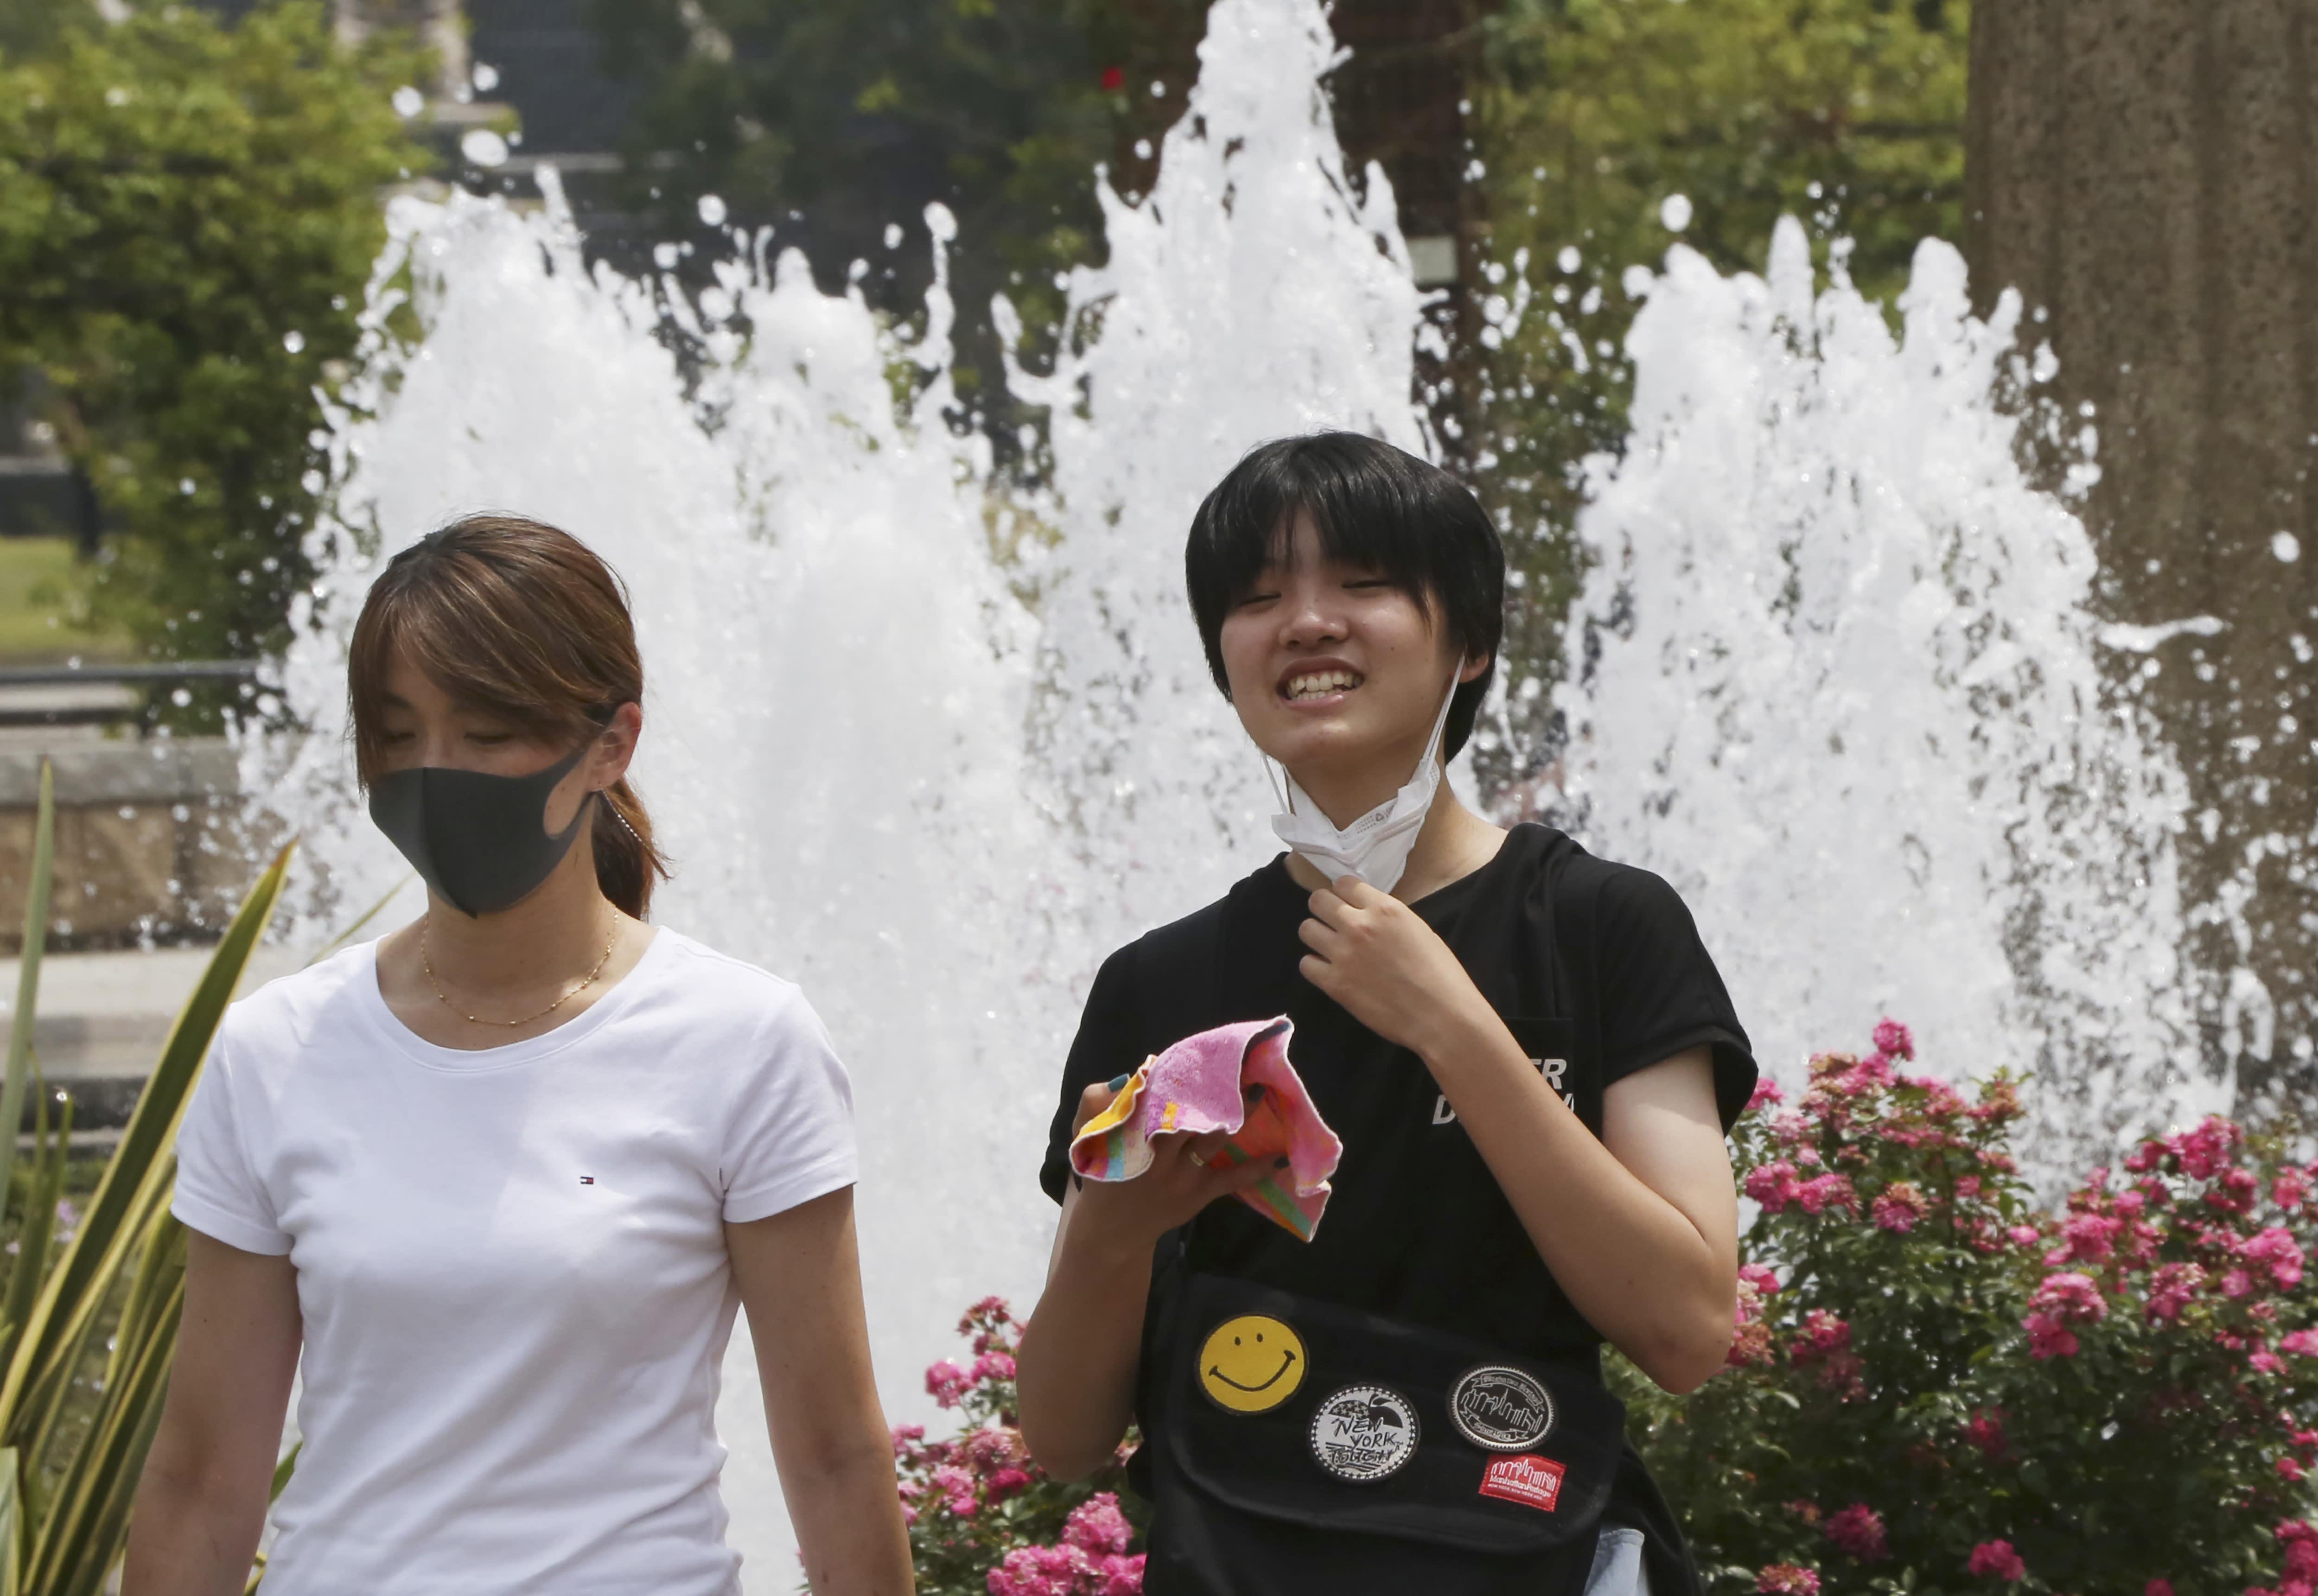 People wearing face masks to protect against the spread of the new coronavirus walk at park in Yokohama near Tokyo, Monday, Aug, 10, 2020. (AP Photo/Koji Sasahara)